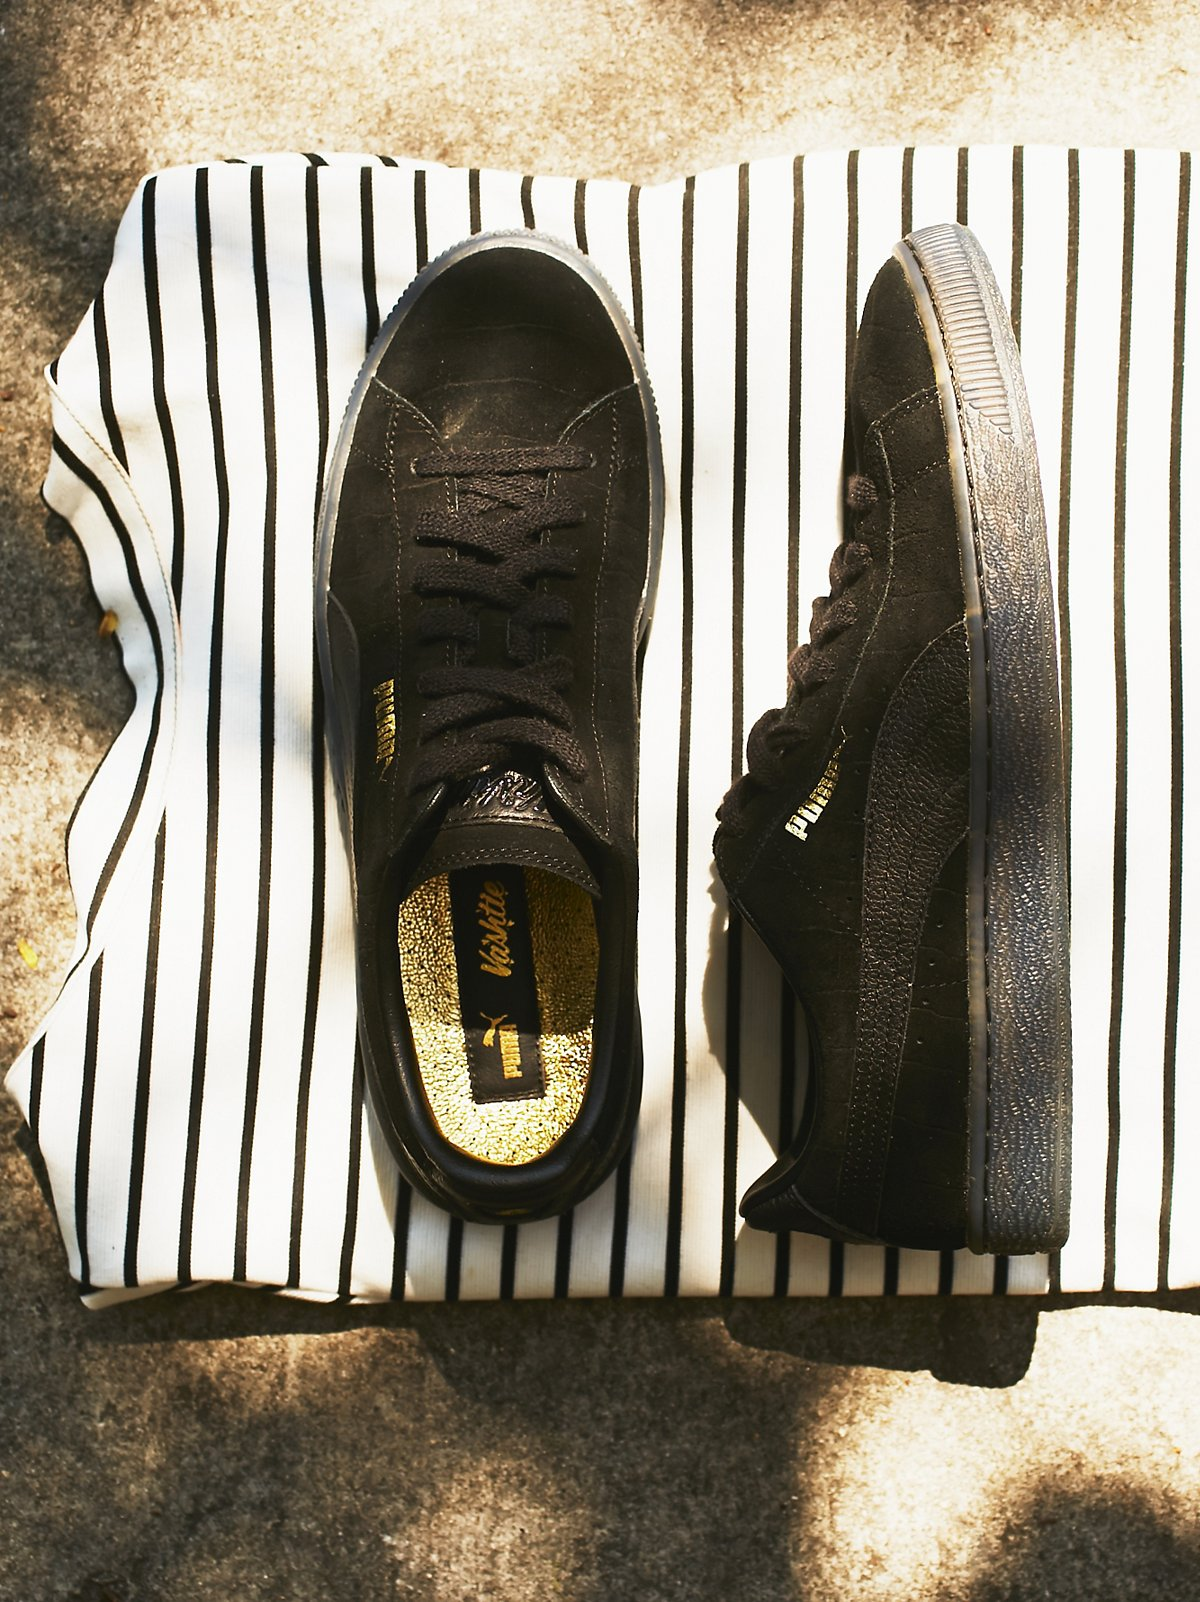 States训练鞋